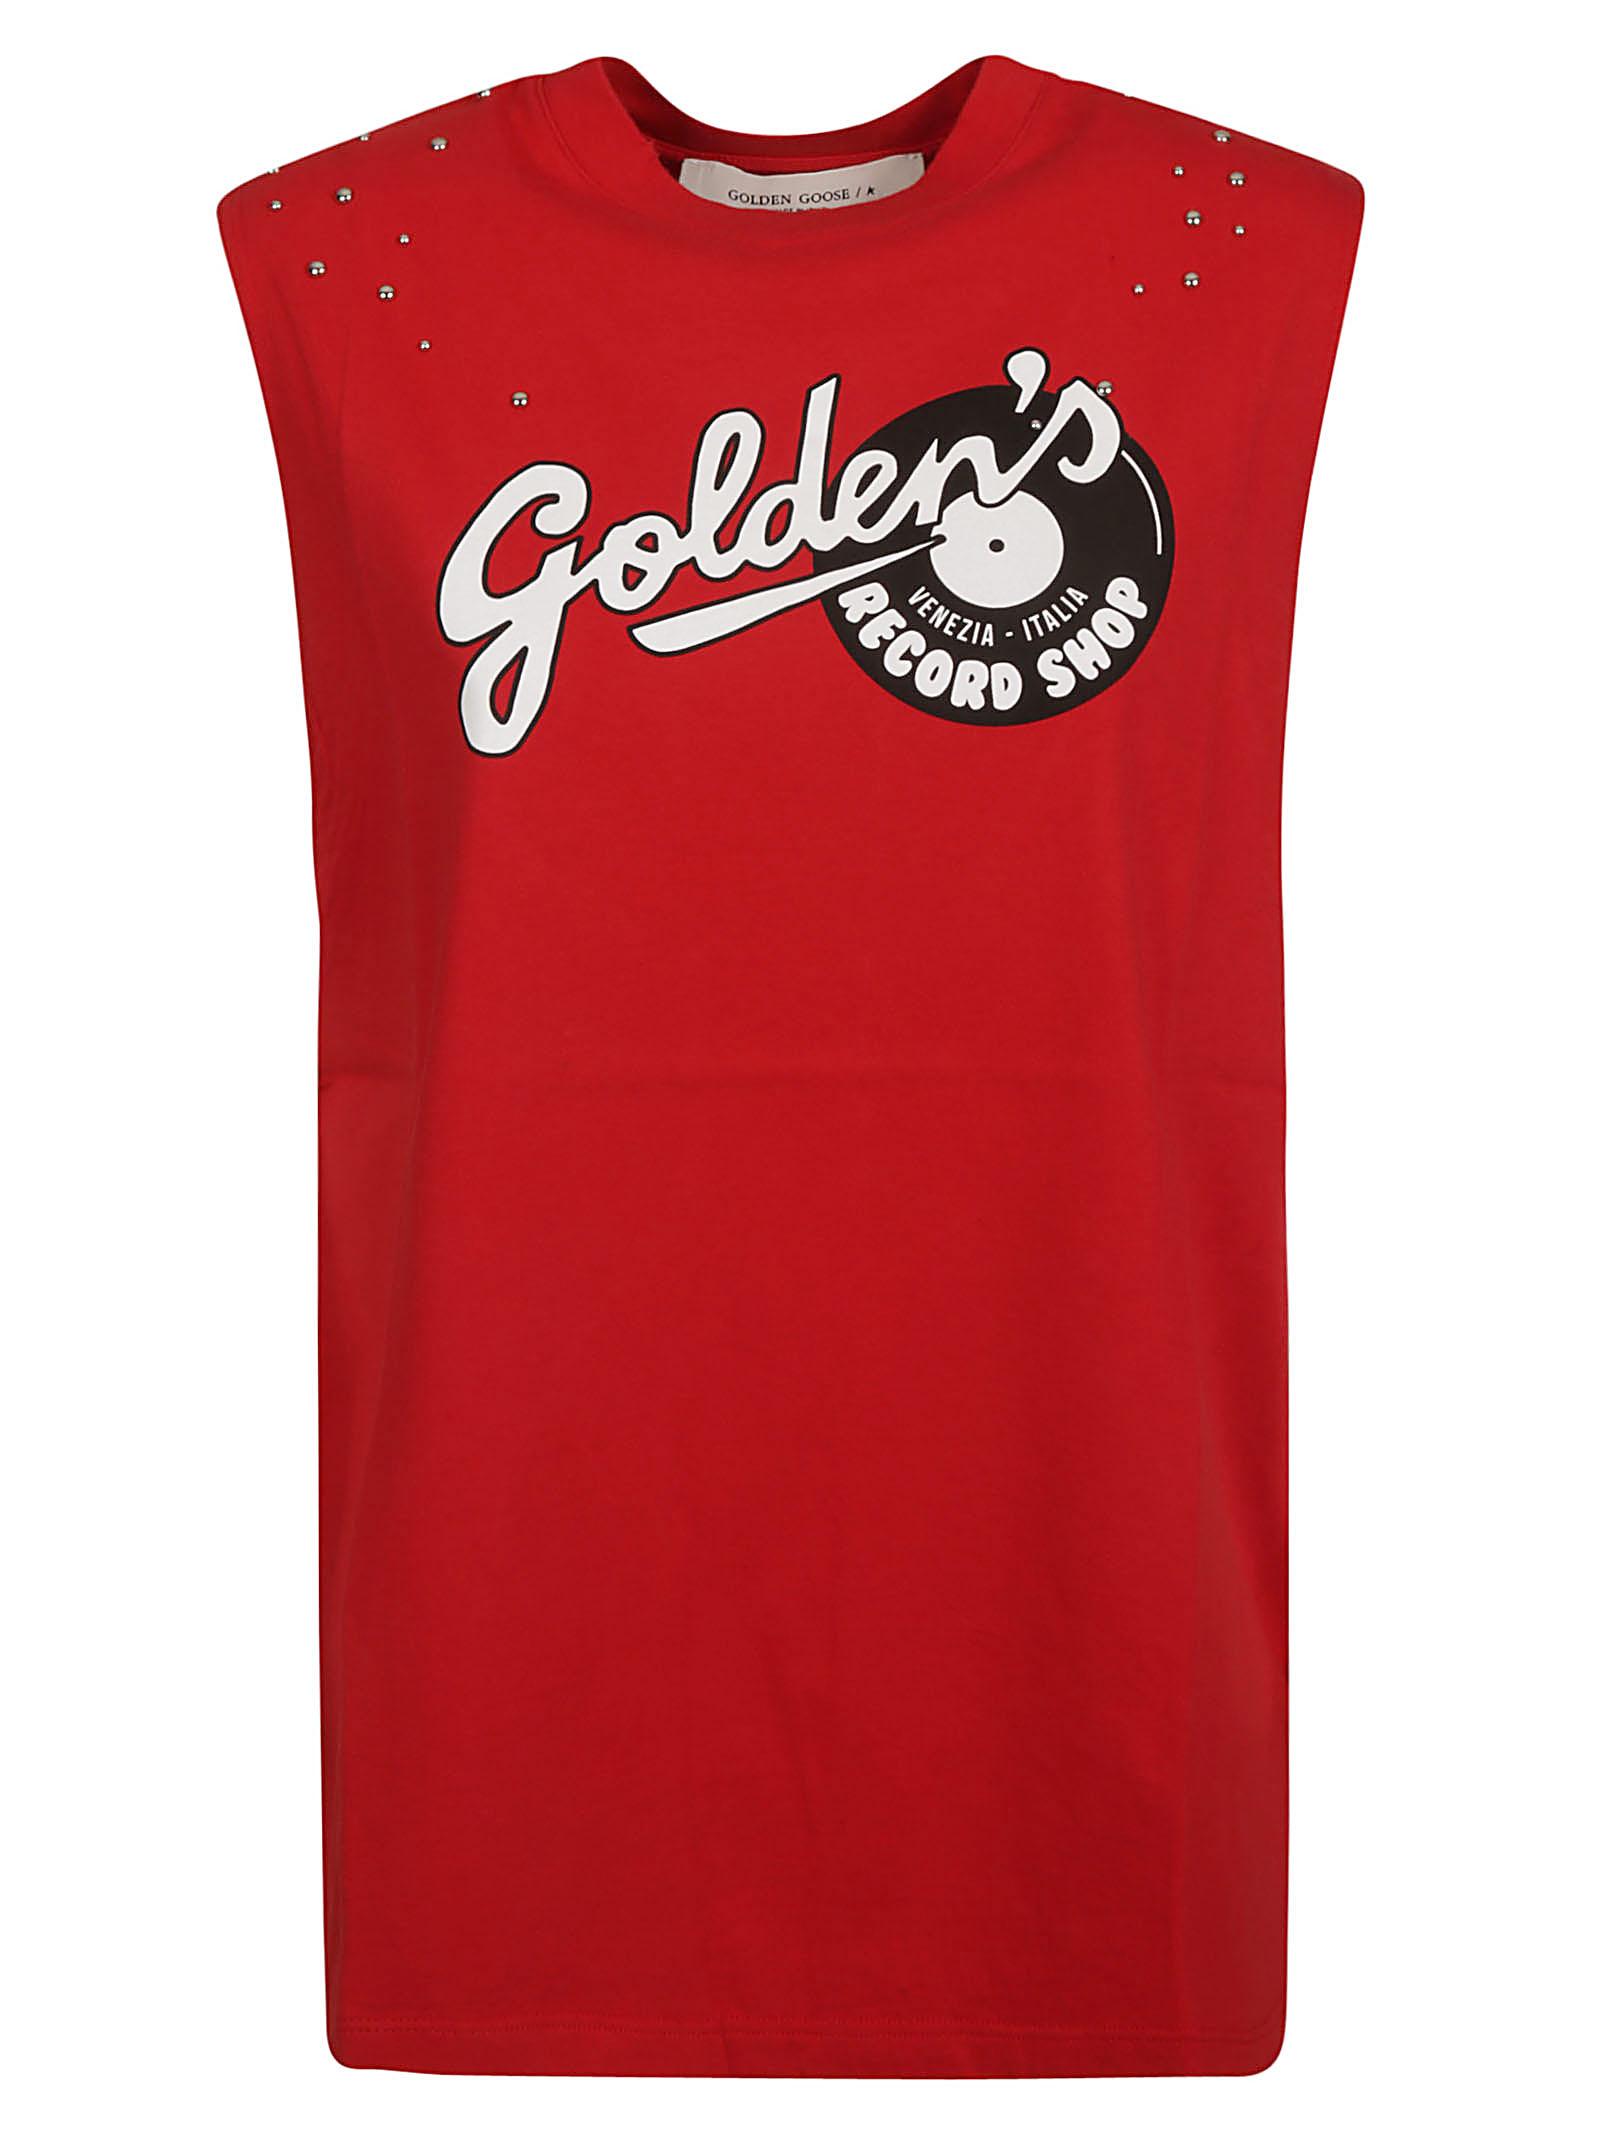 Golden Goose Sleeveless Goldens Record Shop Top